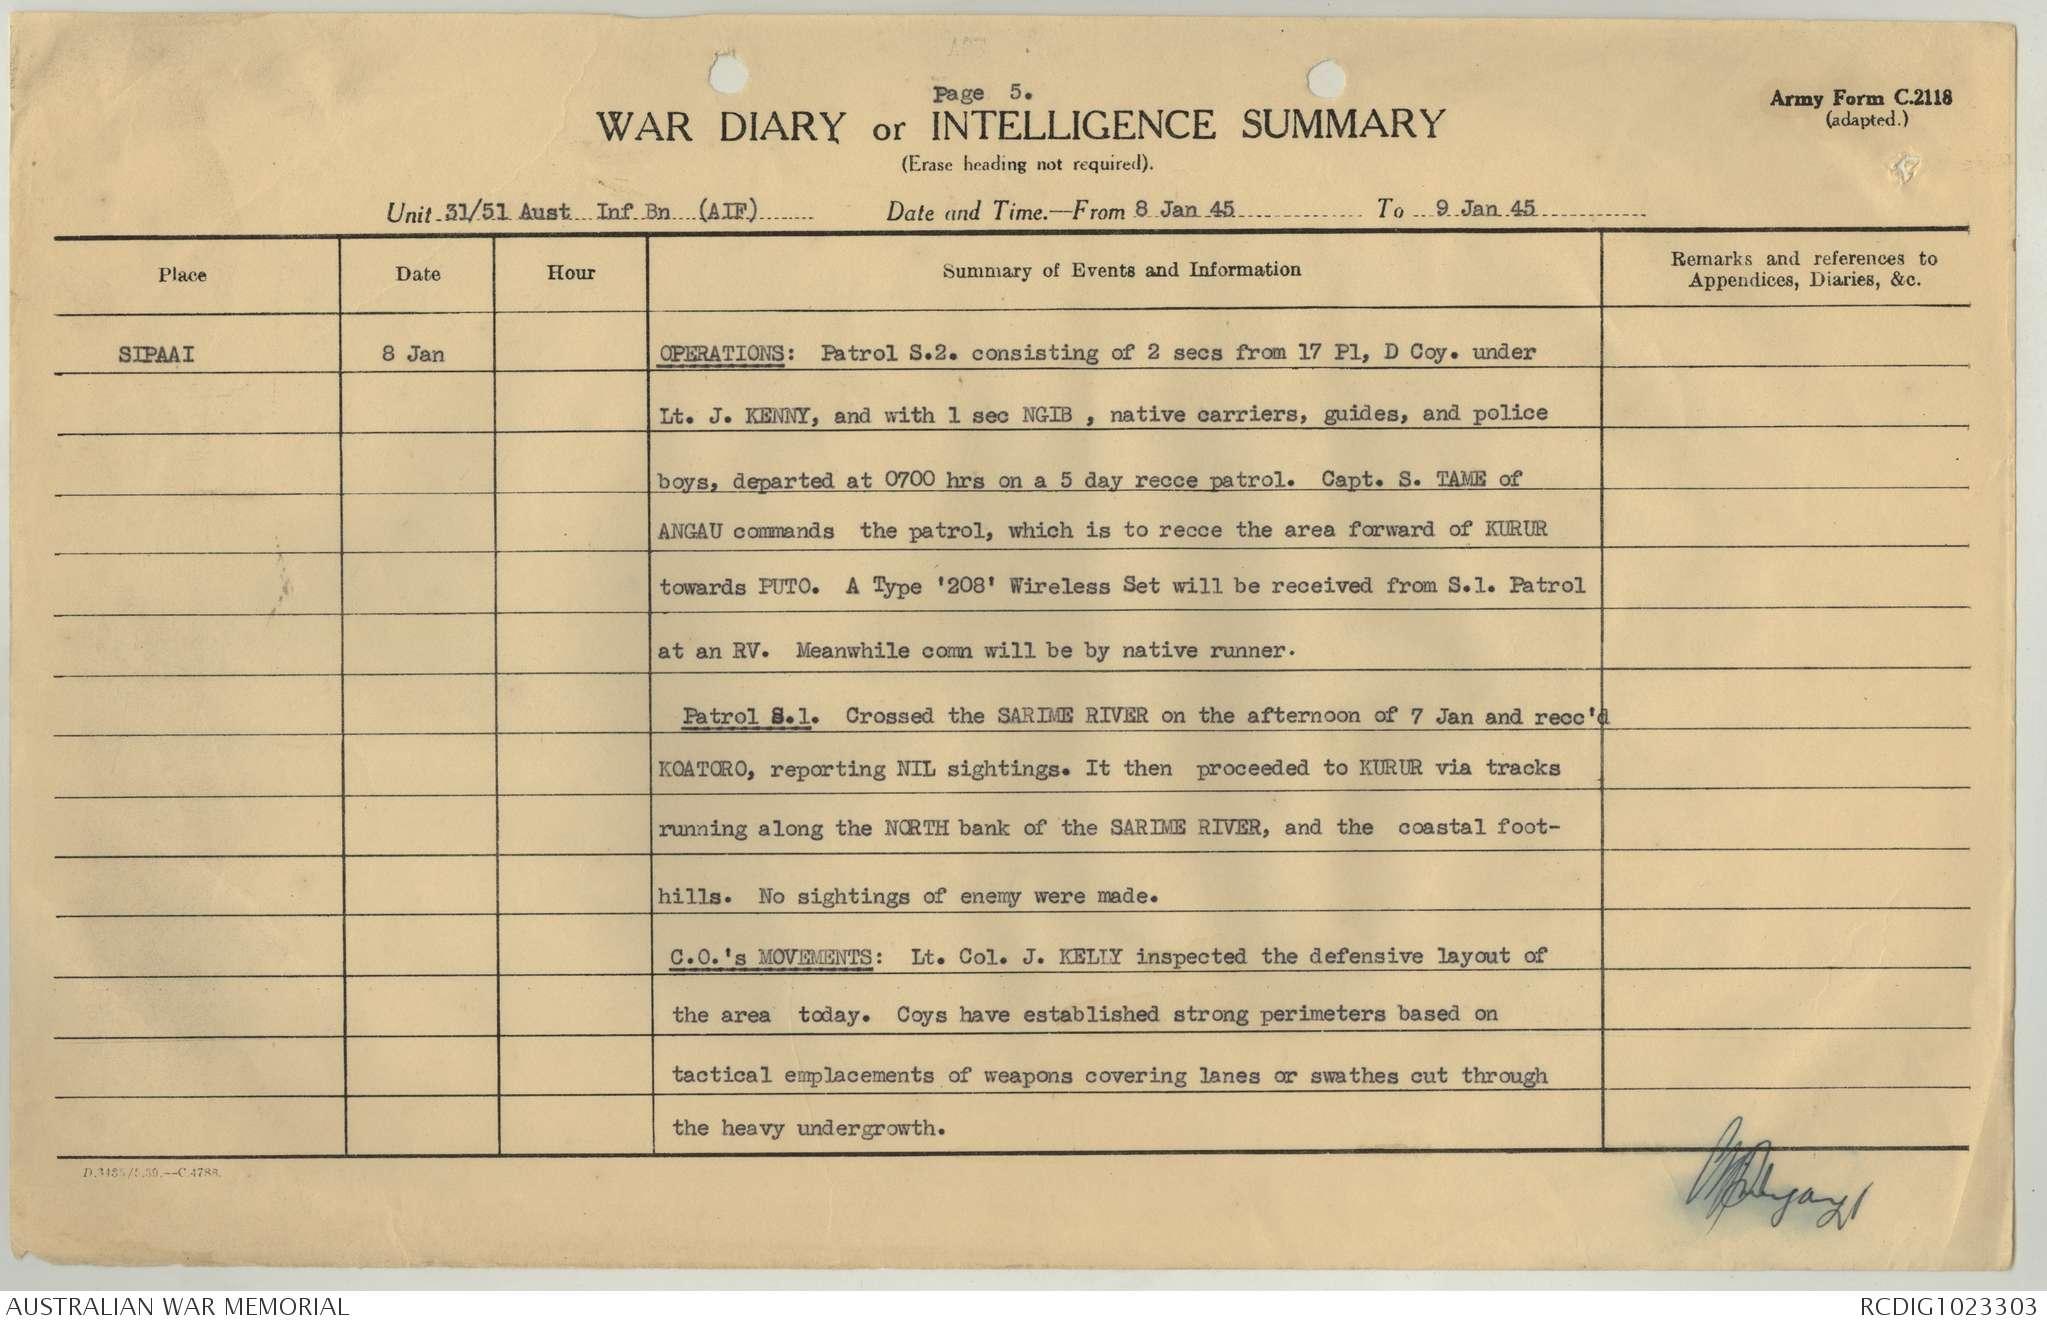 AWM52 8/3/70/26 - January 1945 | The Australian War Memorial